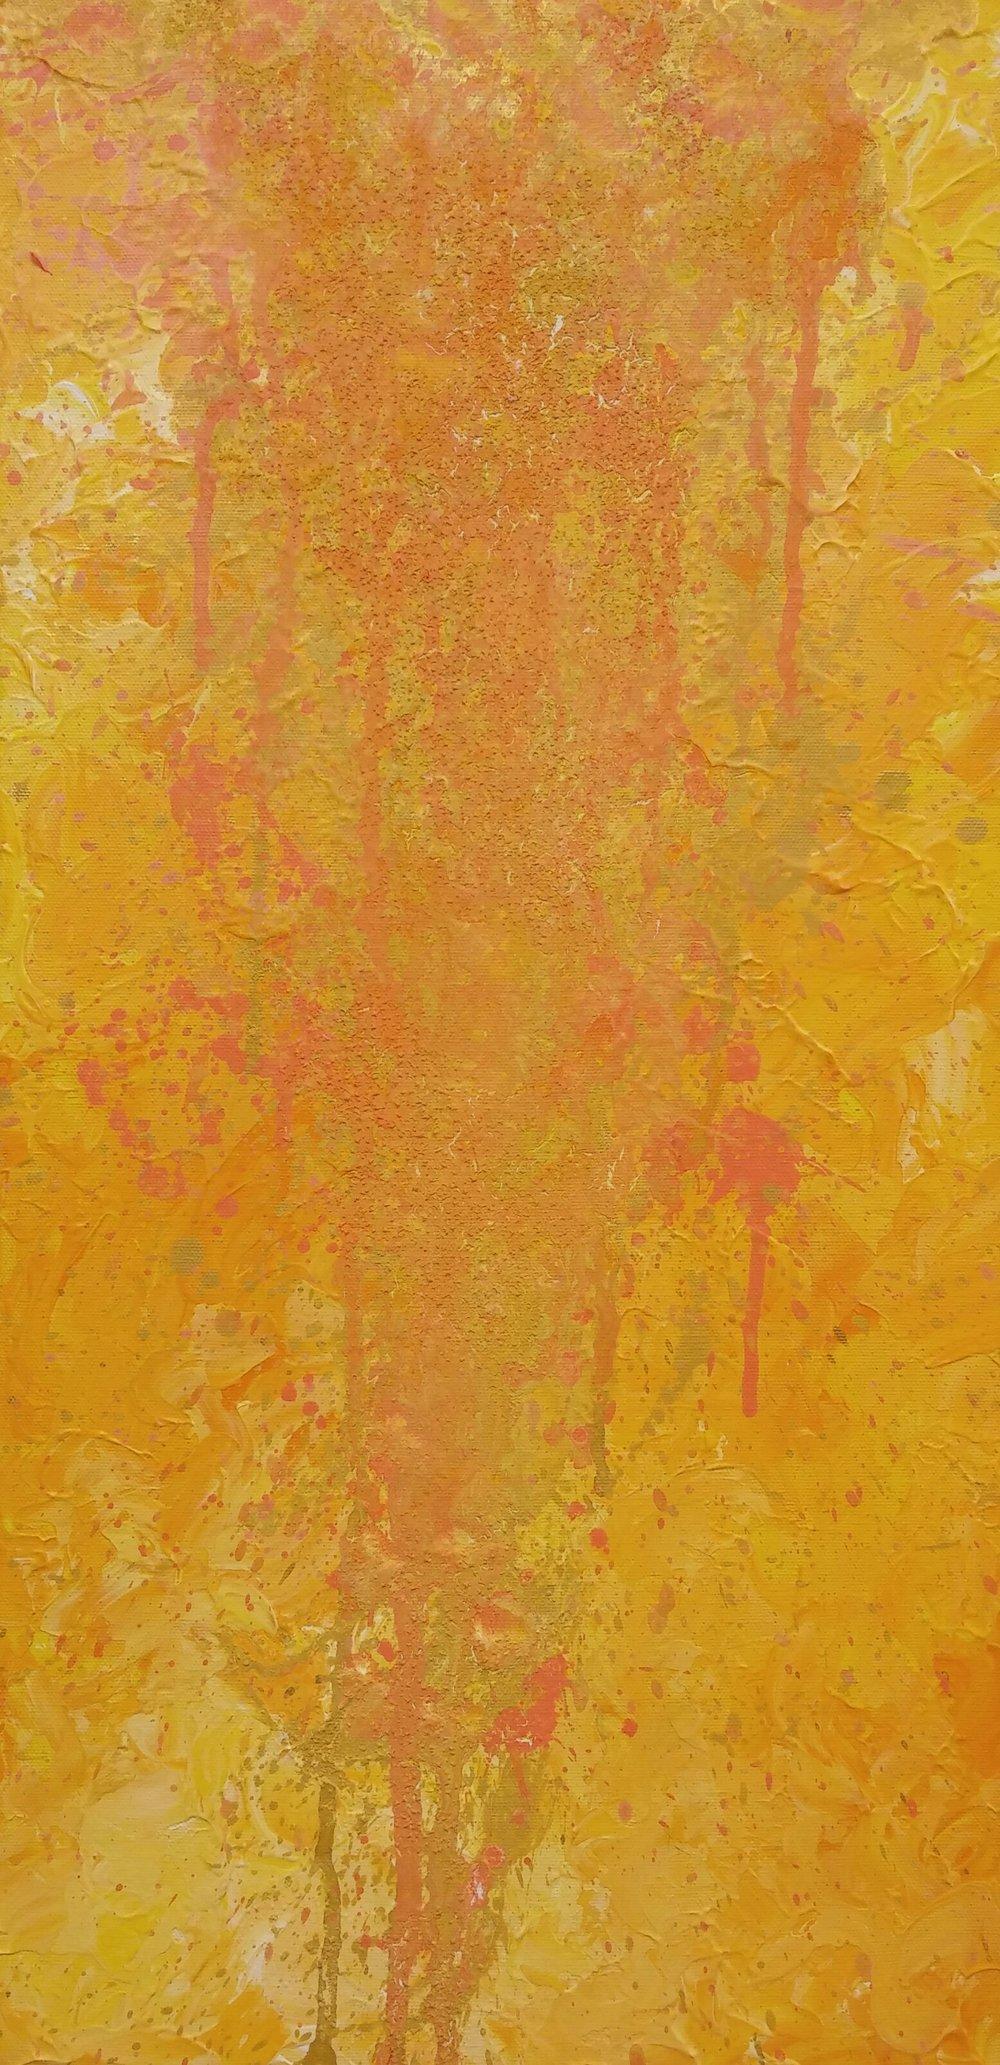 (Yellow) Joy